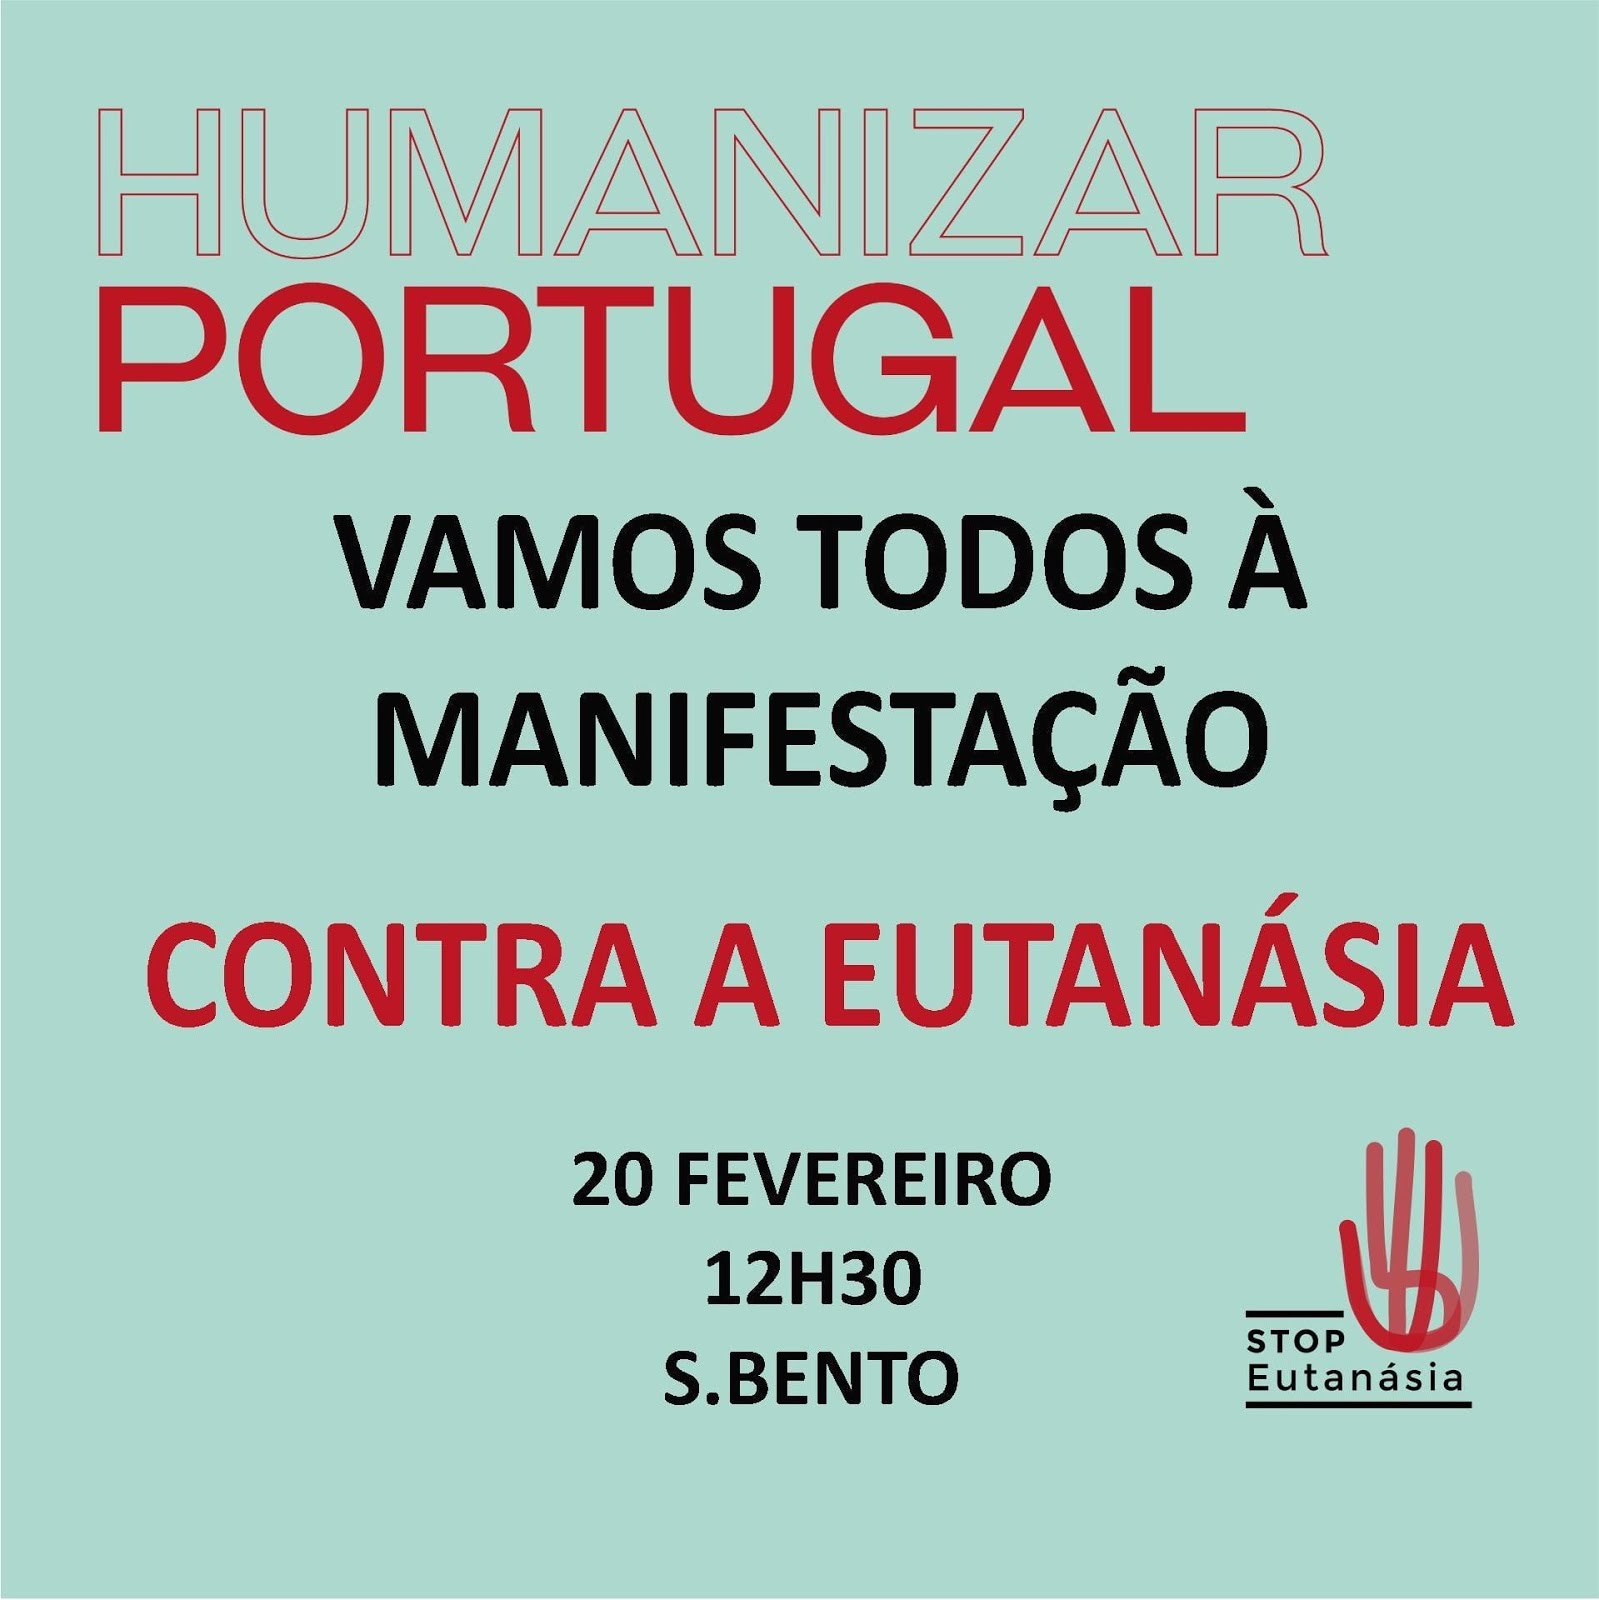 20 de fevereiro, 12h30: Lisboa